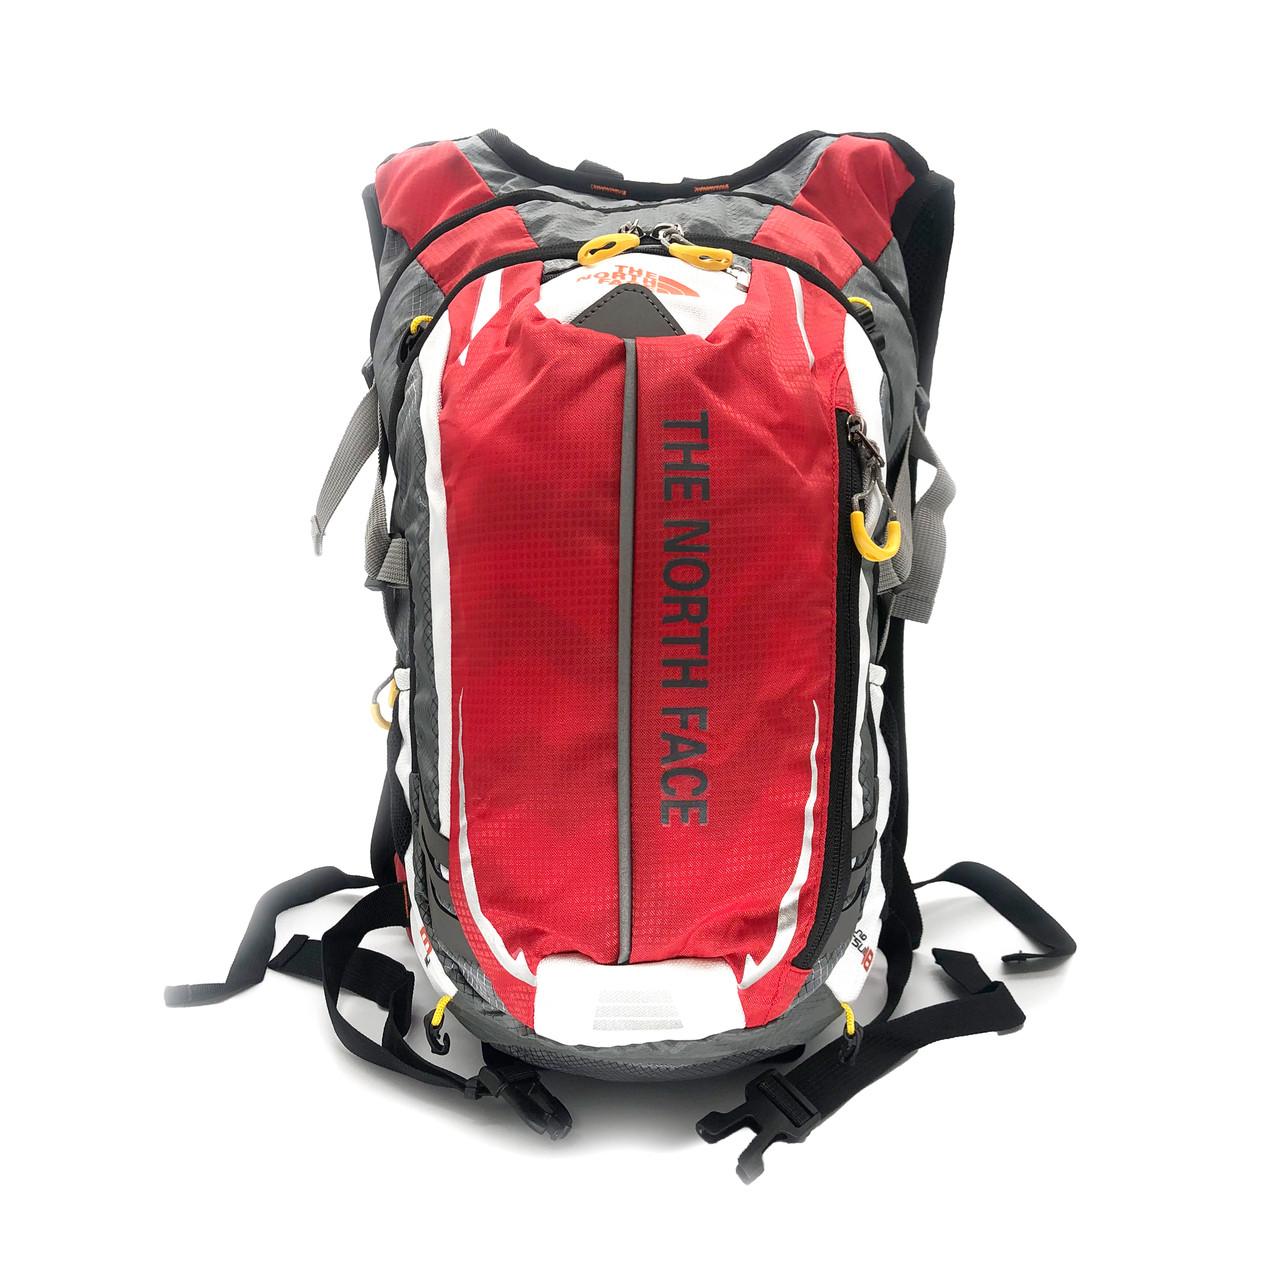 Спортивный рюкзак для бега - фото 1